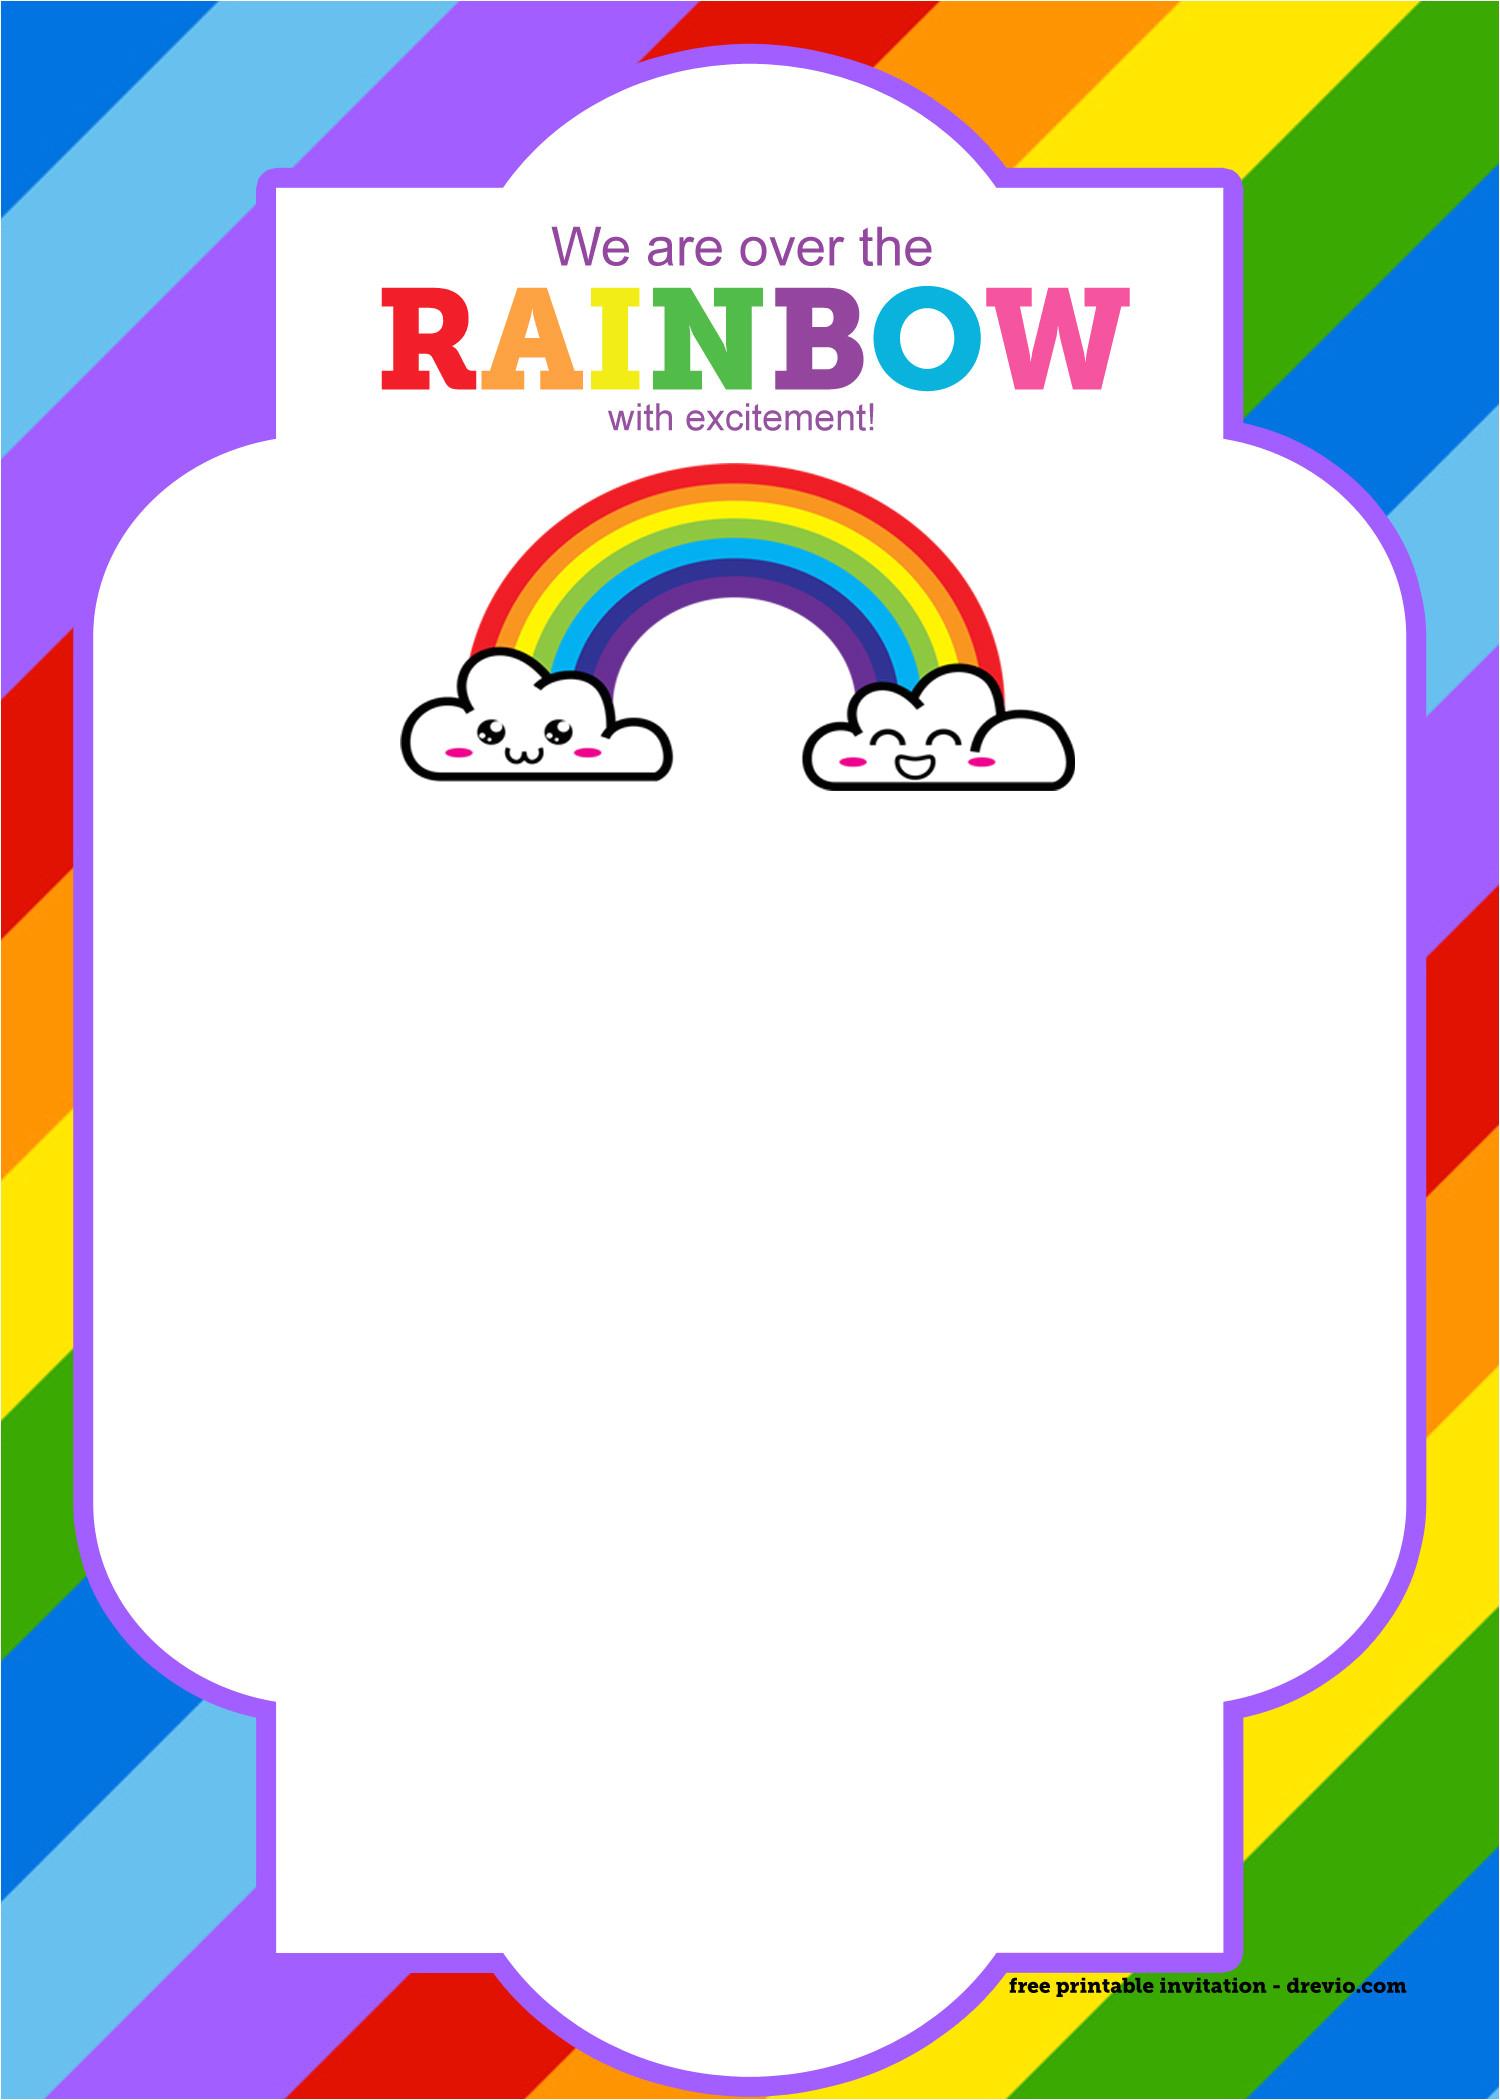 free printable rainbow invitation template thank you card